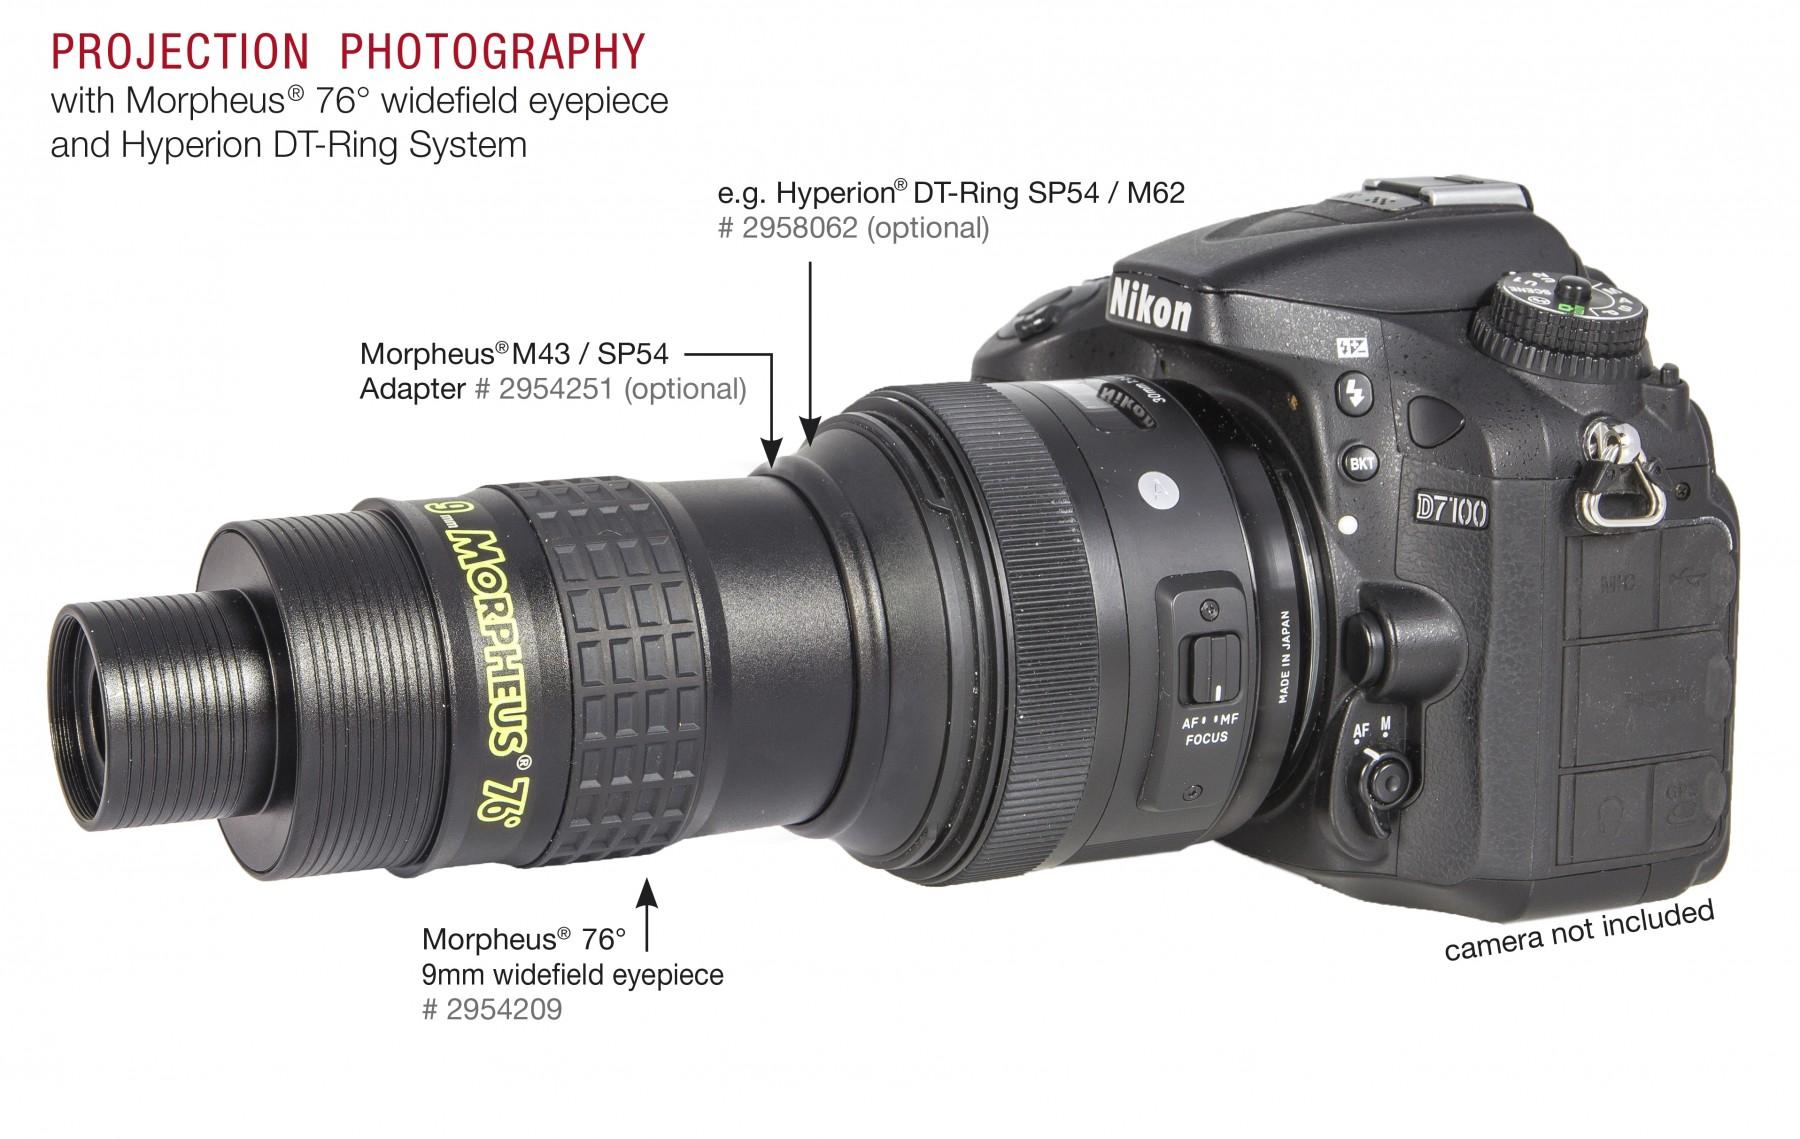 Application image: Morpheus 76° für Projektionsfotografie